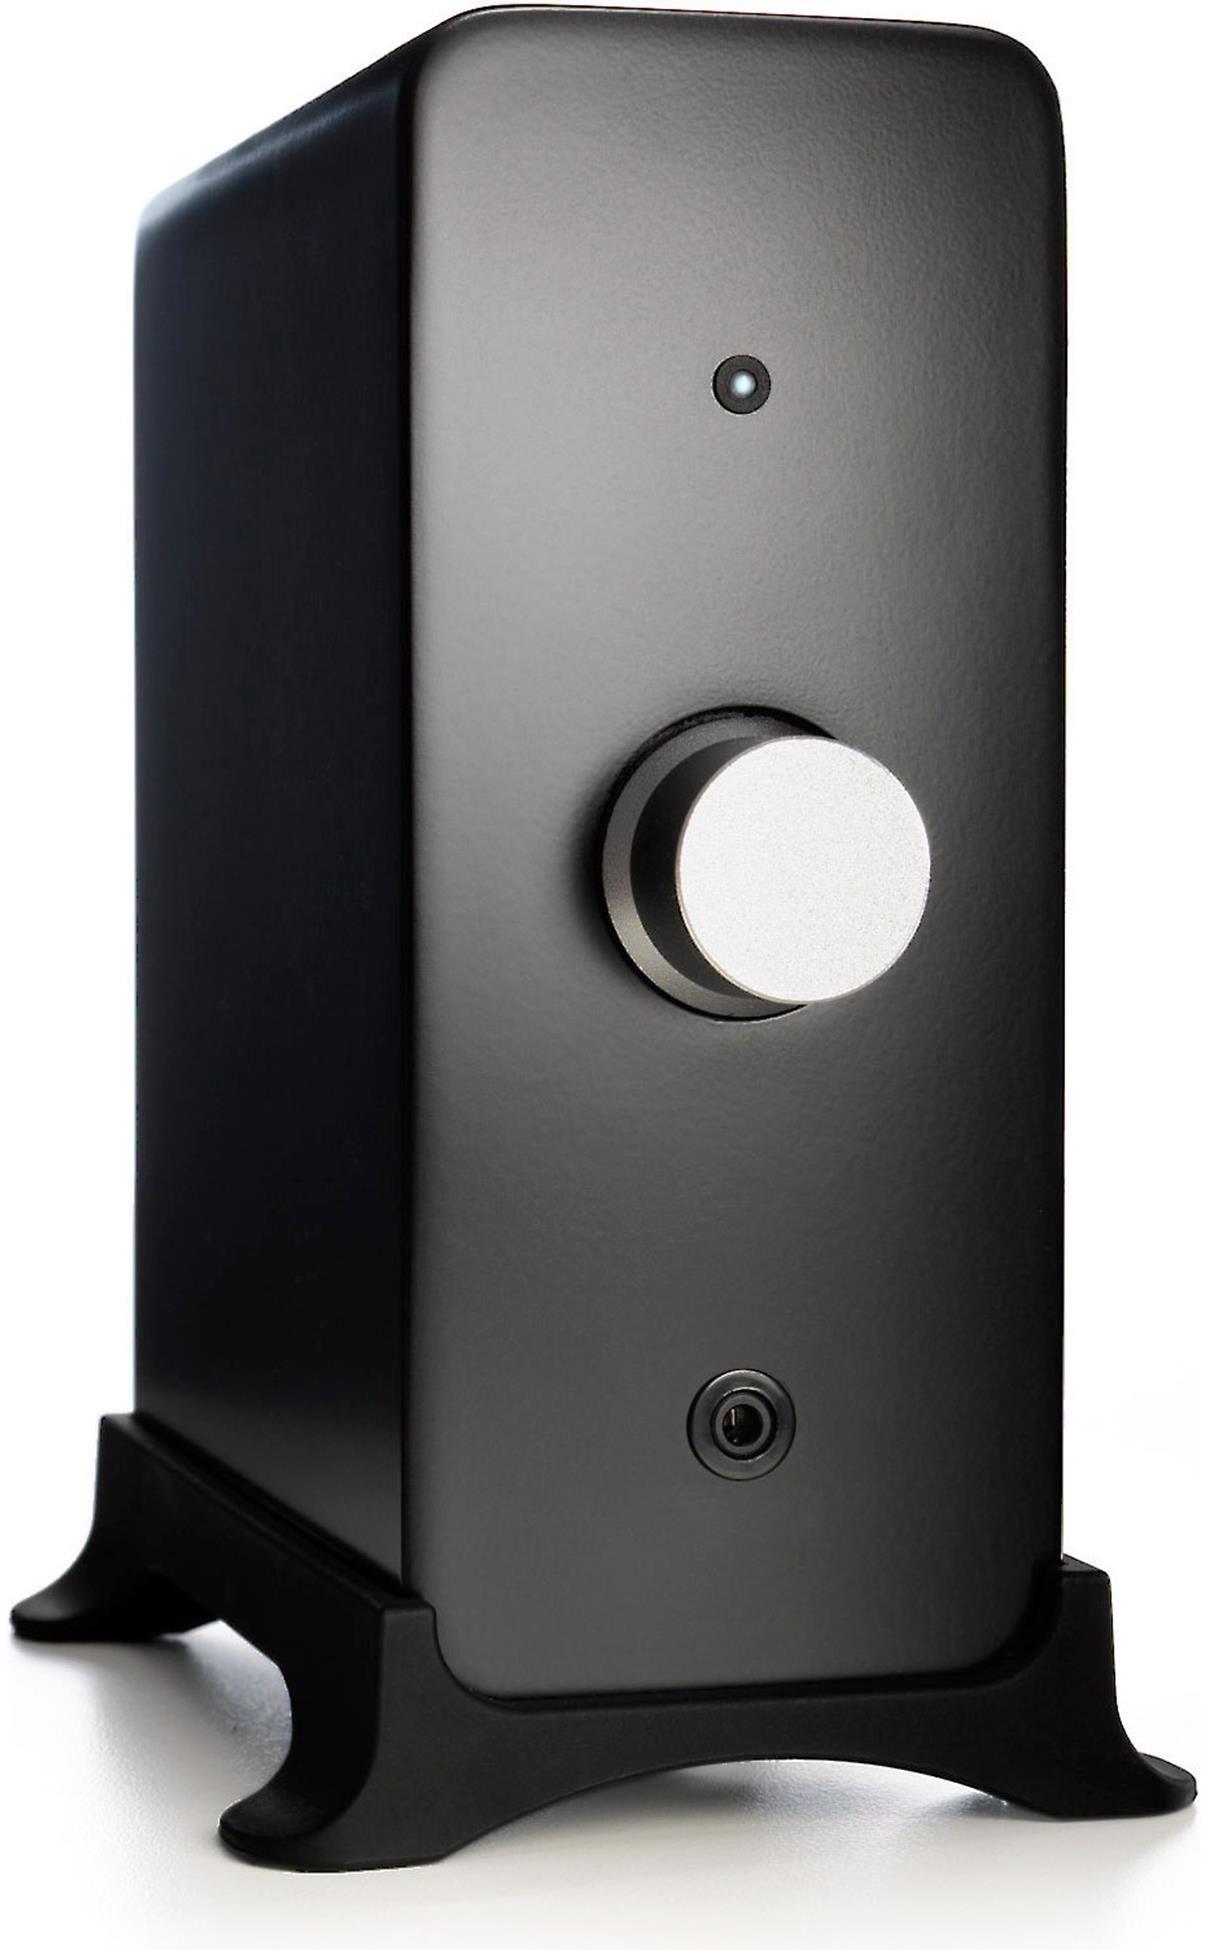 Daftar Harga Audioengine Hd3 Black Terbaru 2018 Jaket Motor Pria Rc661 Our Catalog Home Entertainment Hdtvs Automation West Allis 275 Desktop Audio Amplifier N22